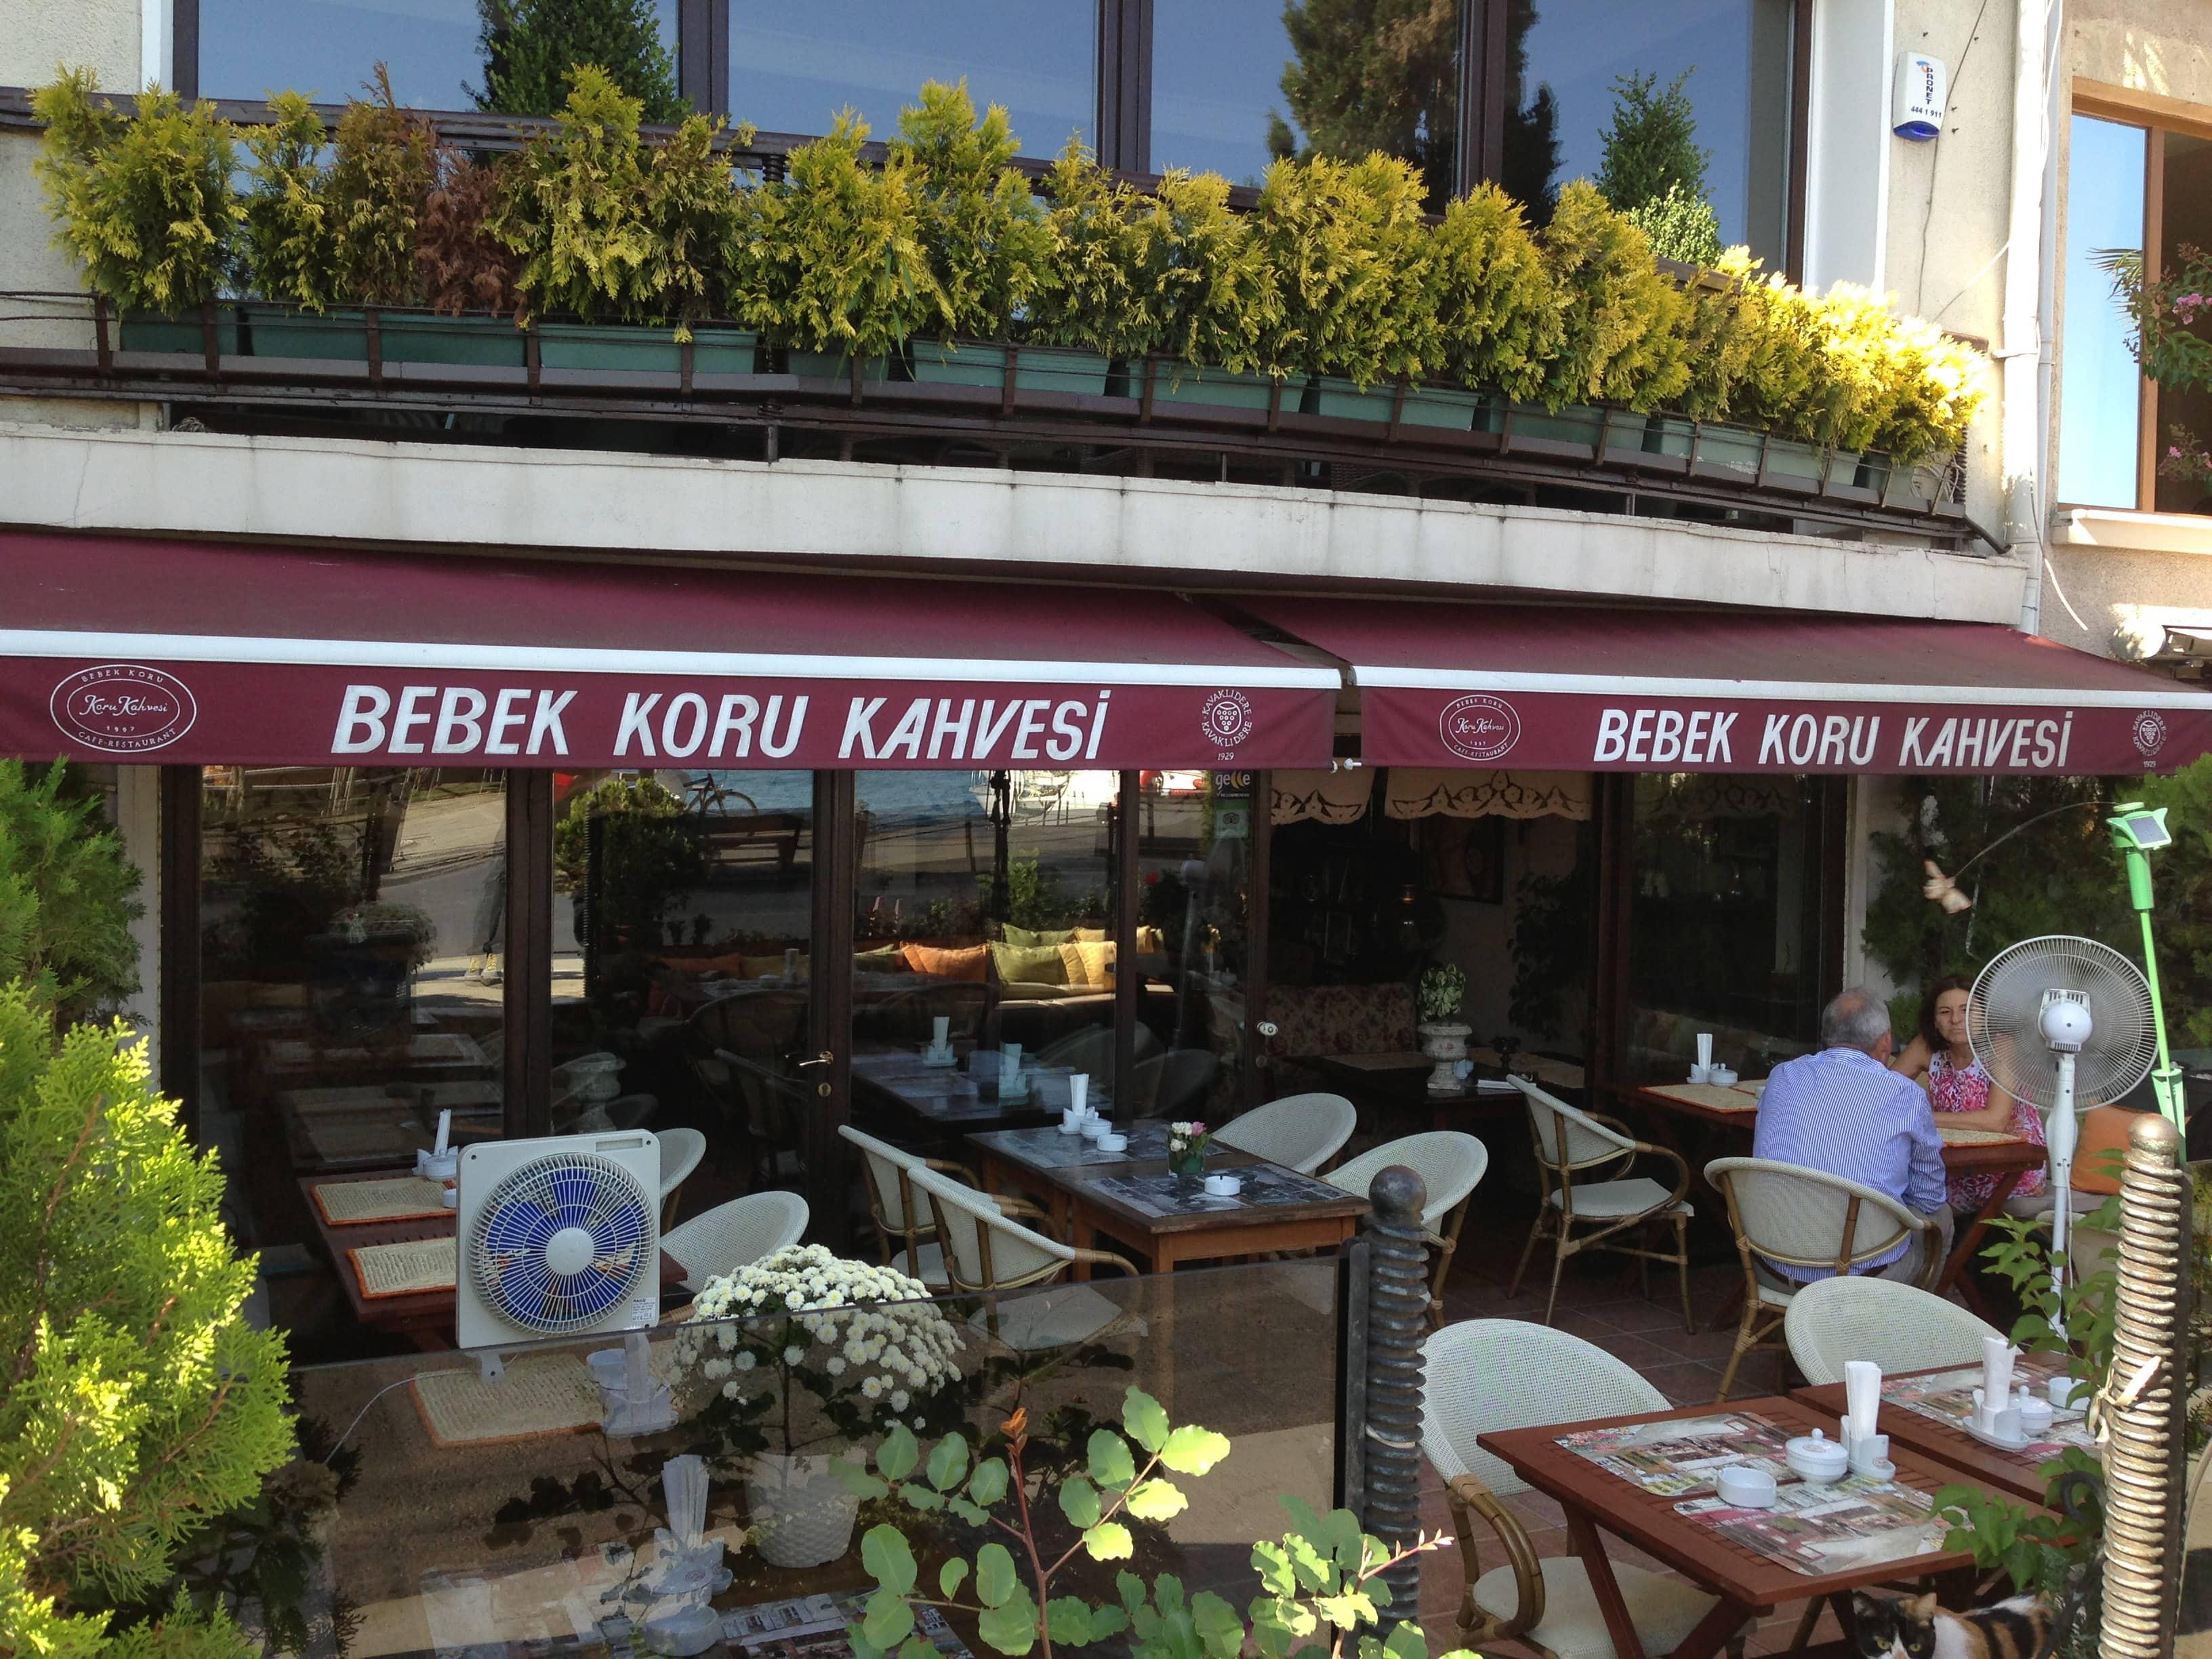 Bebek Koru Kahvesi, Bebek, İstanbul | Zomato